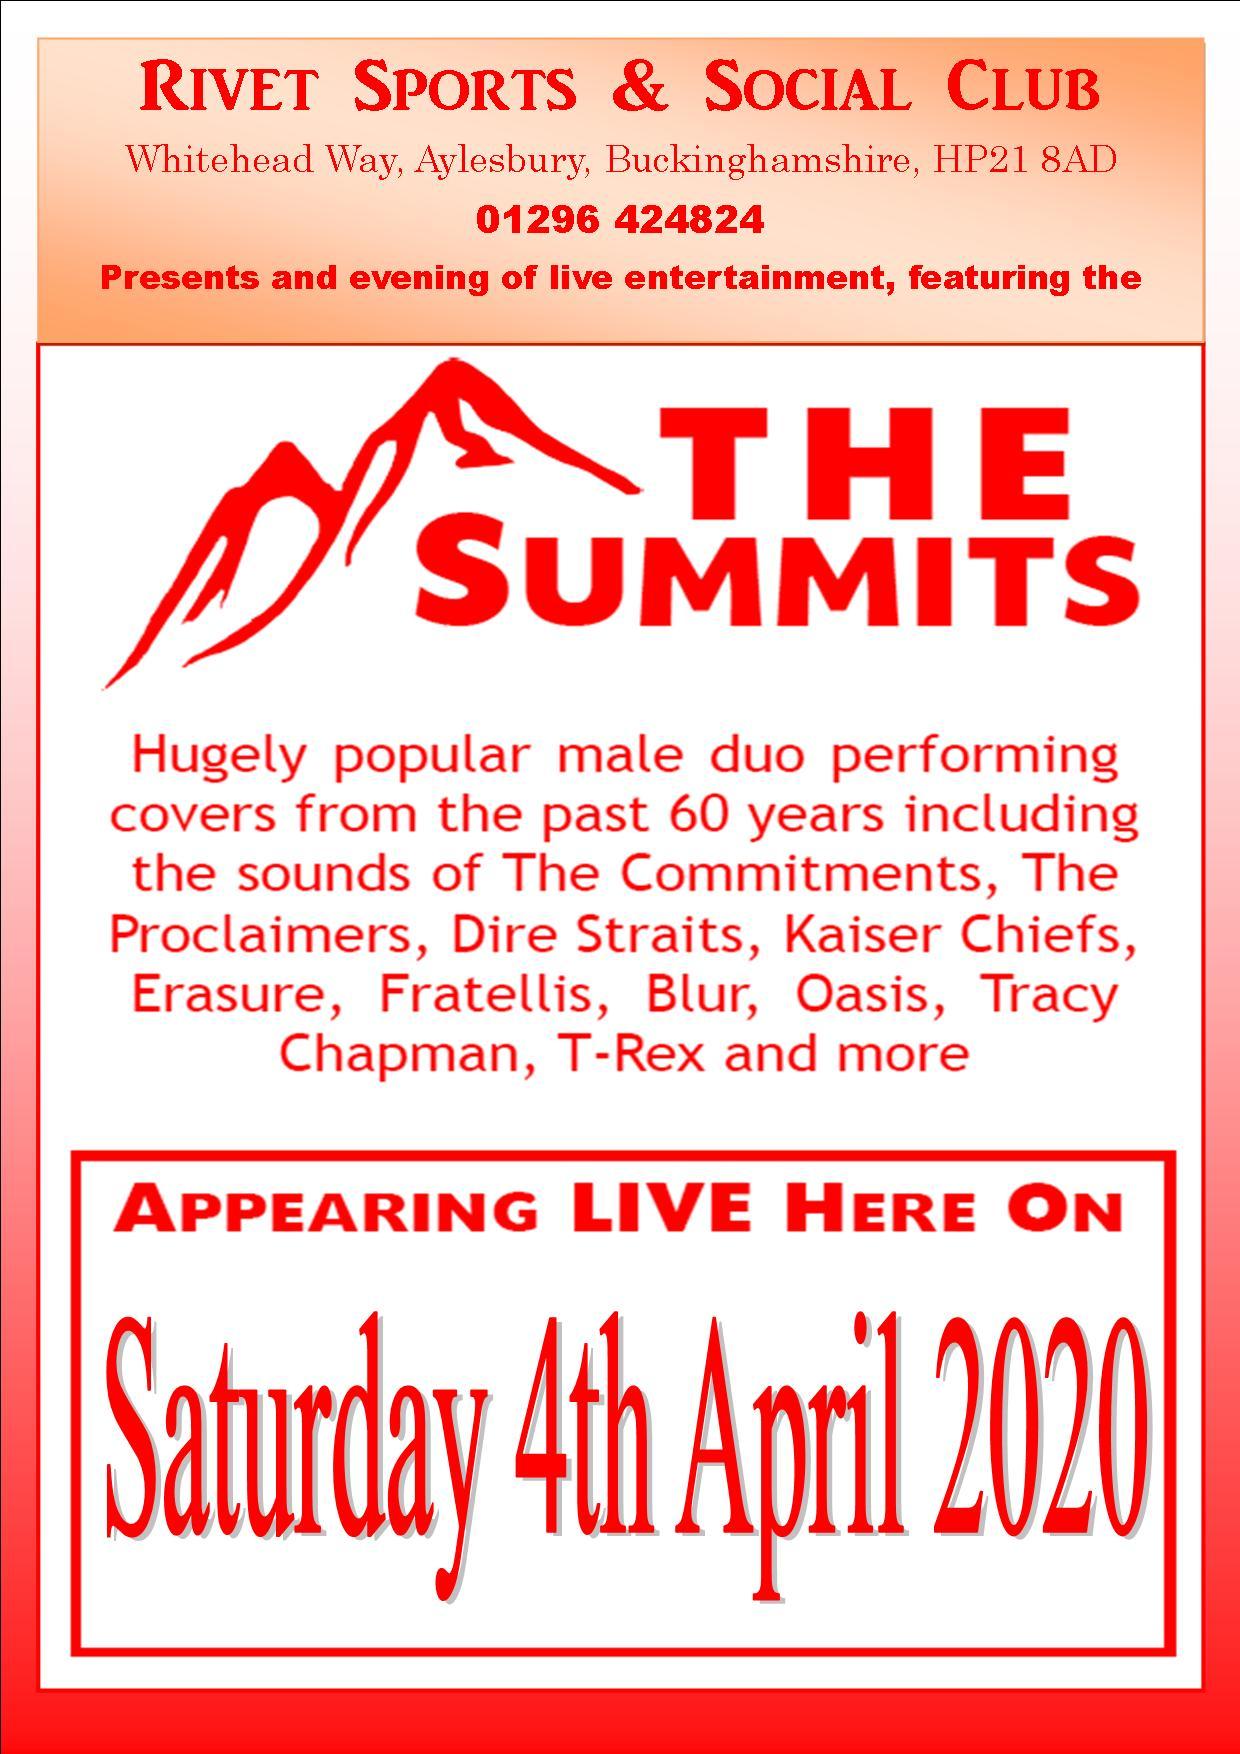 The Summits